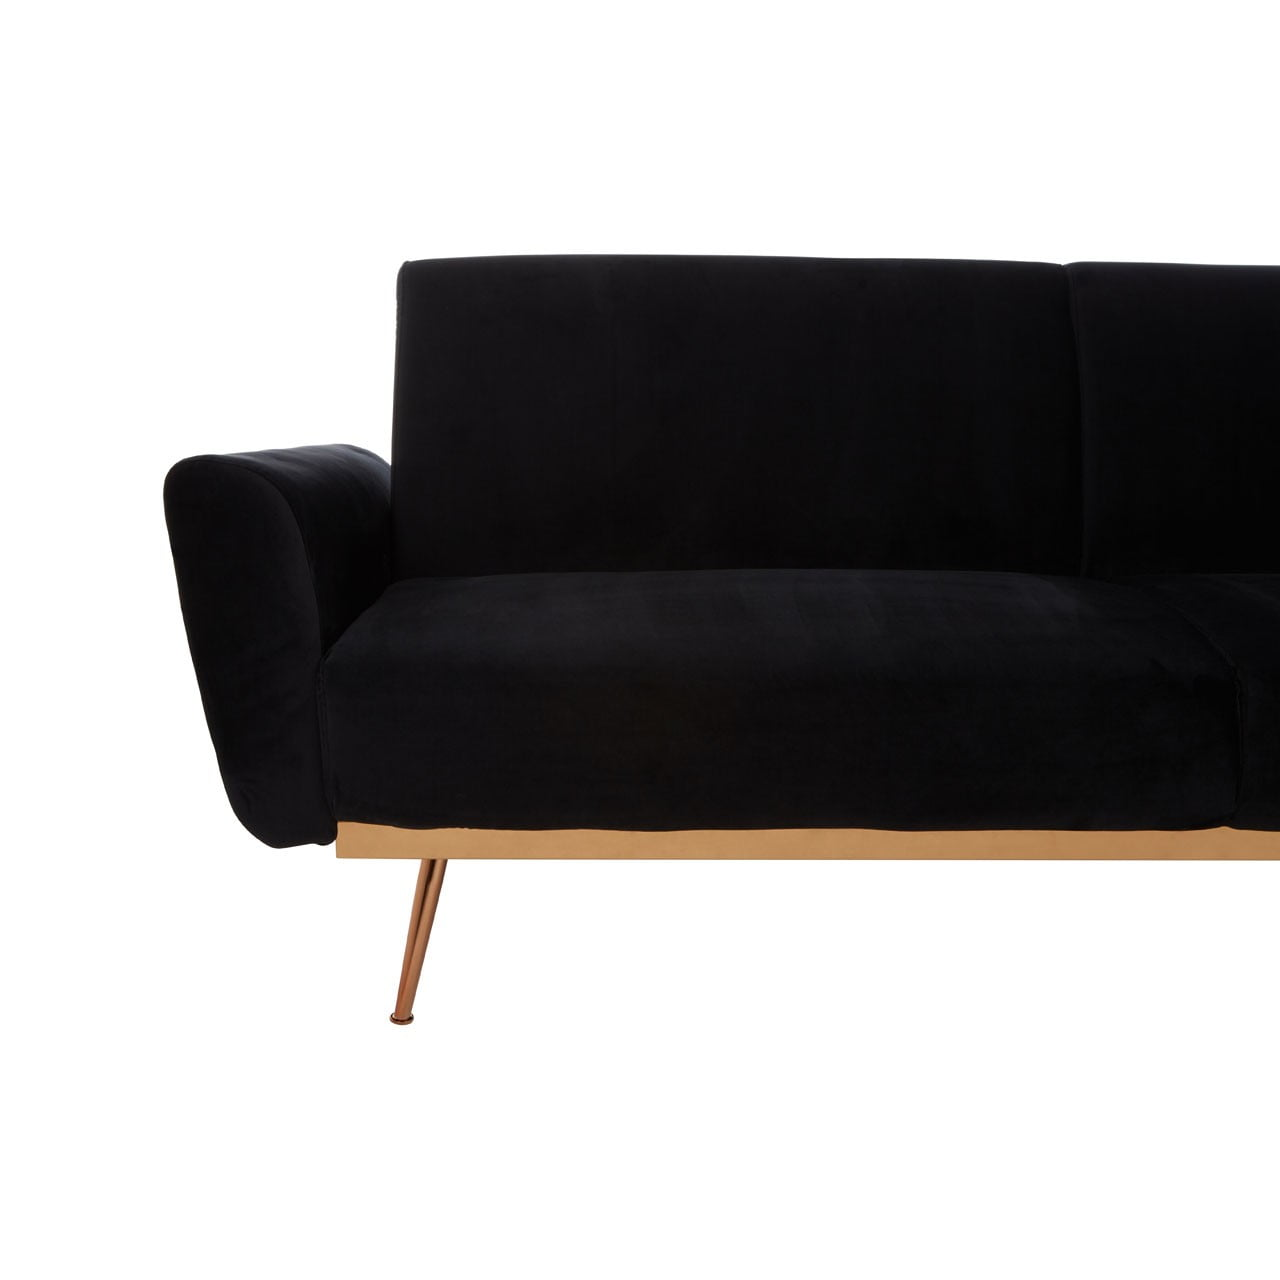 Boden Black Velvet Sofa Bed No5a Interiors